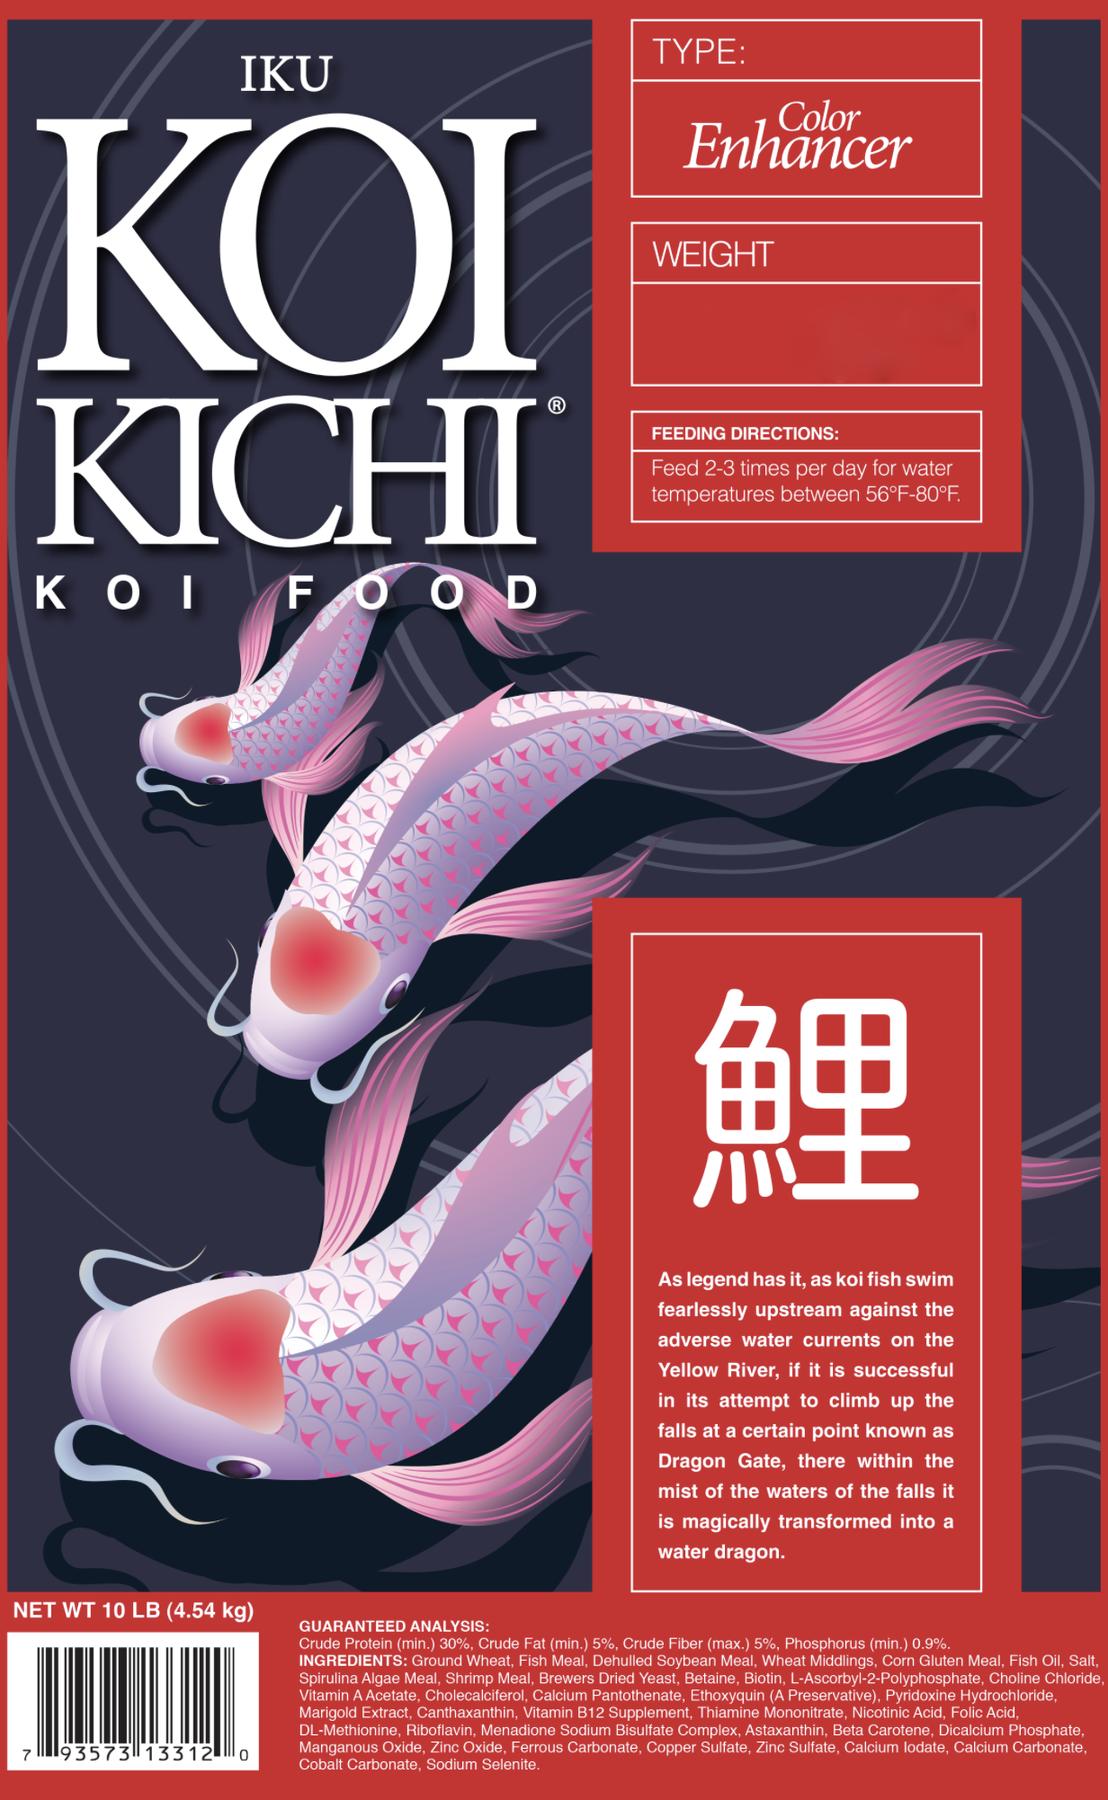 Iku Koi Kichi Color Enhancer Koi Fish Food